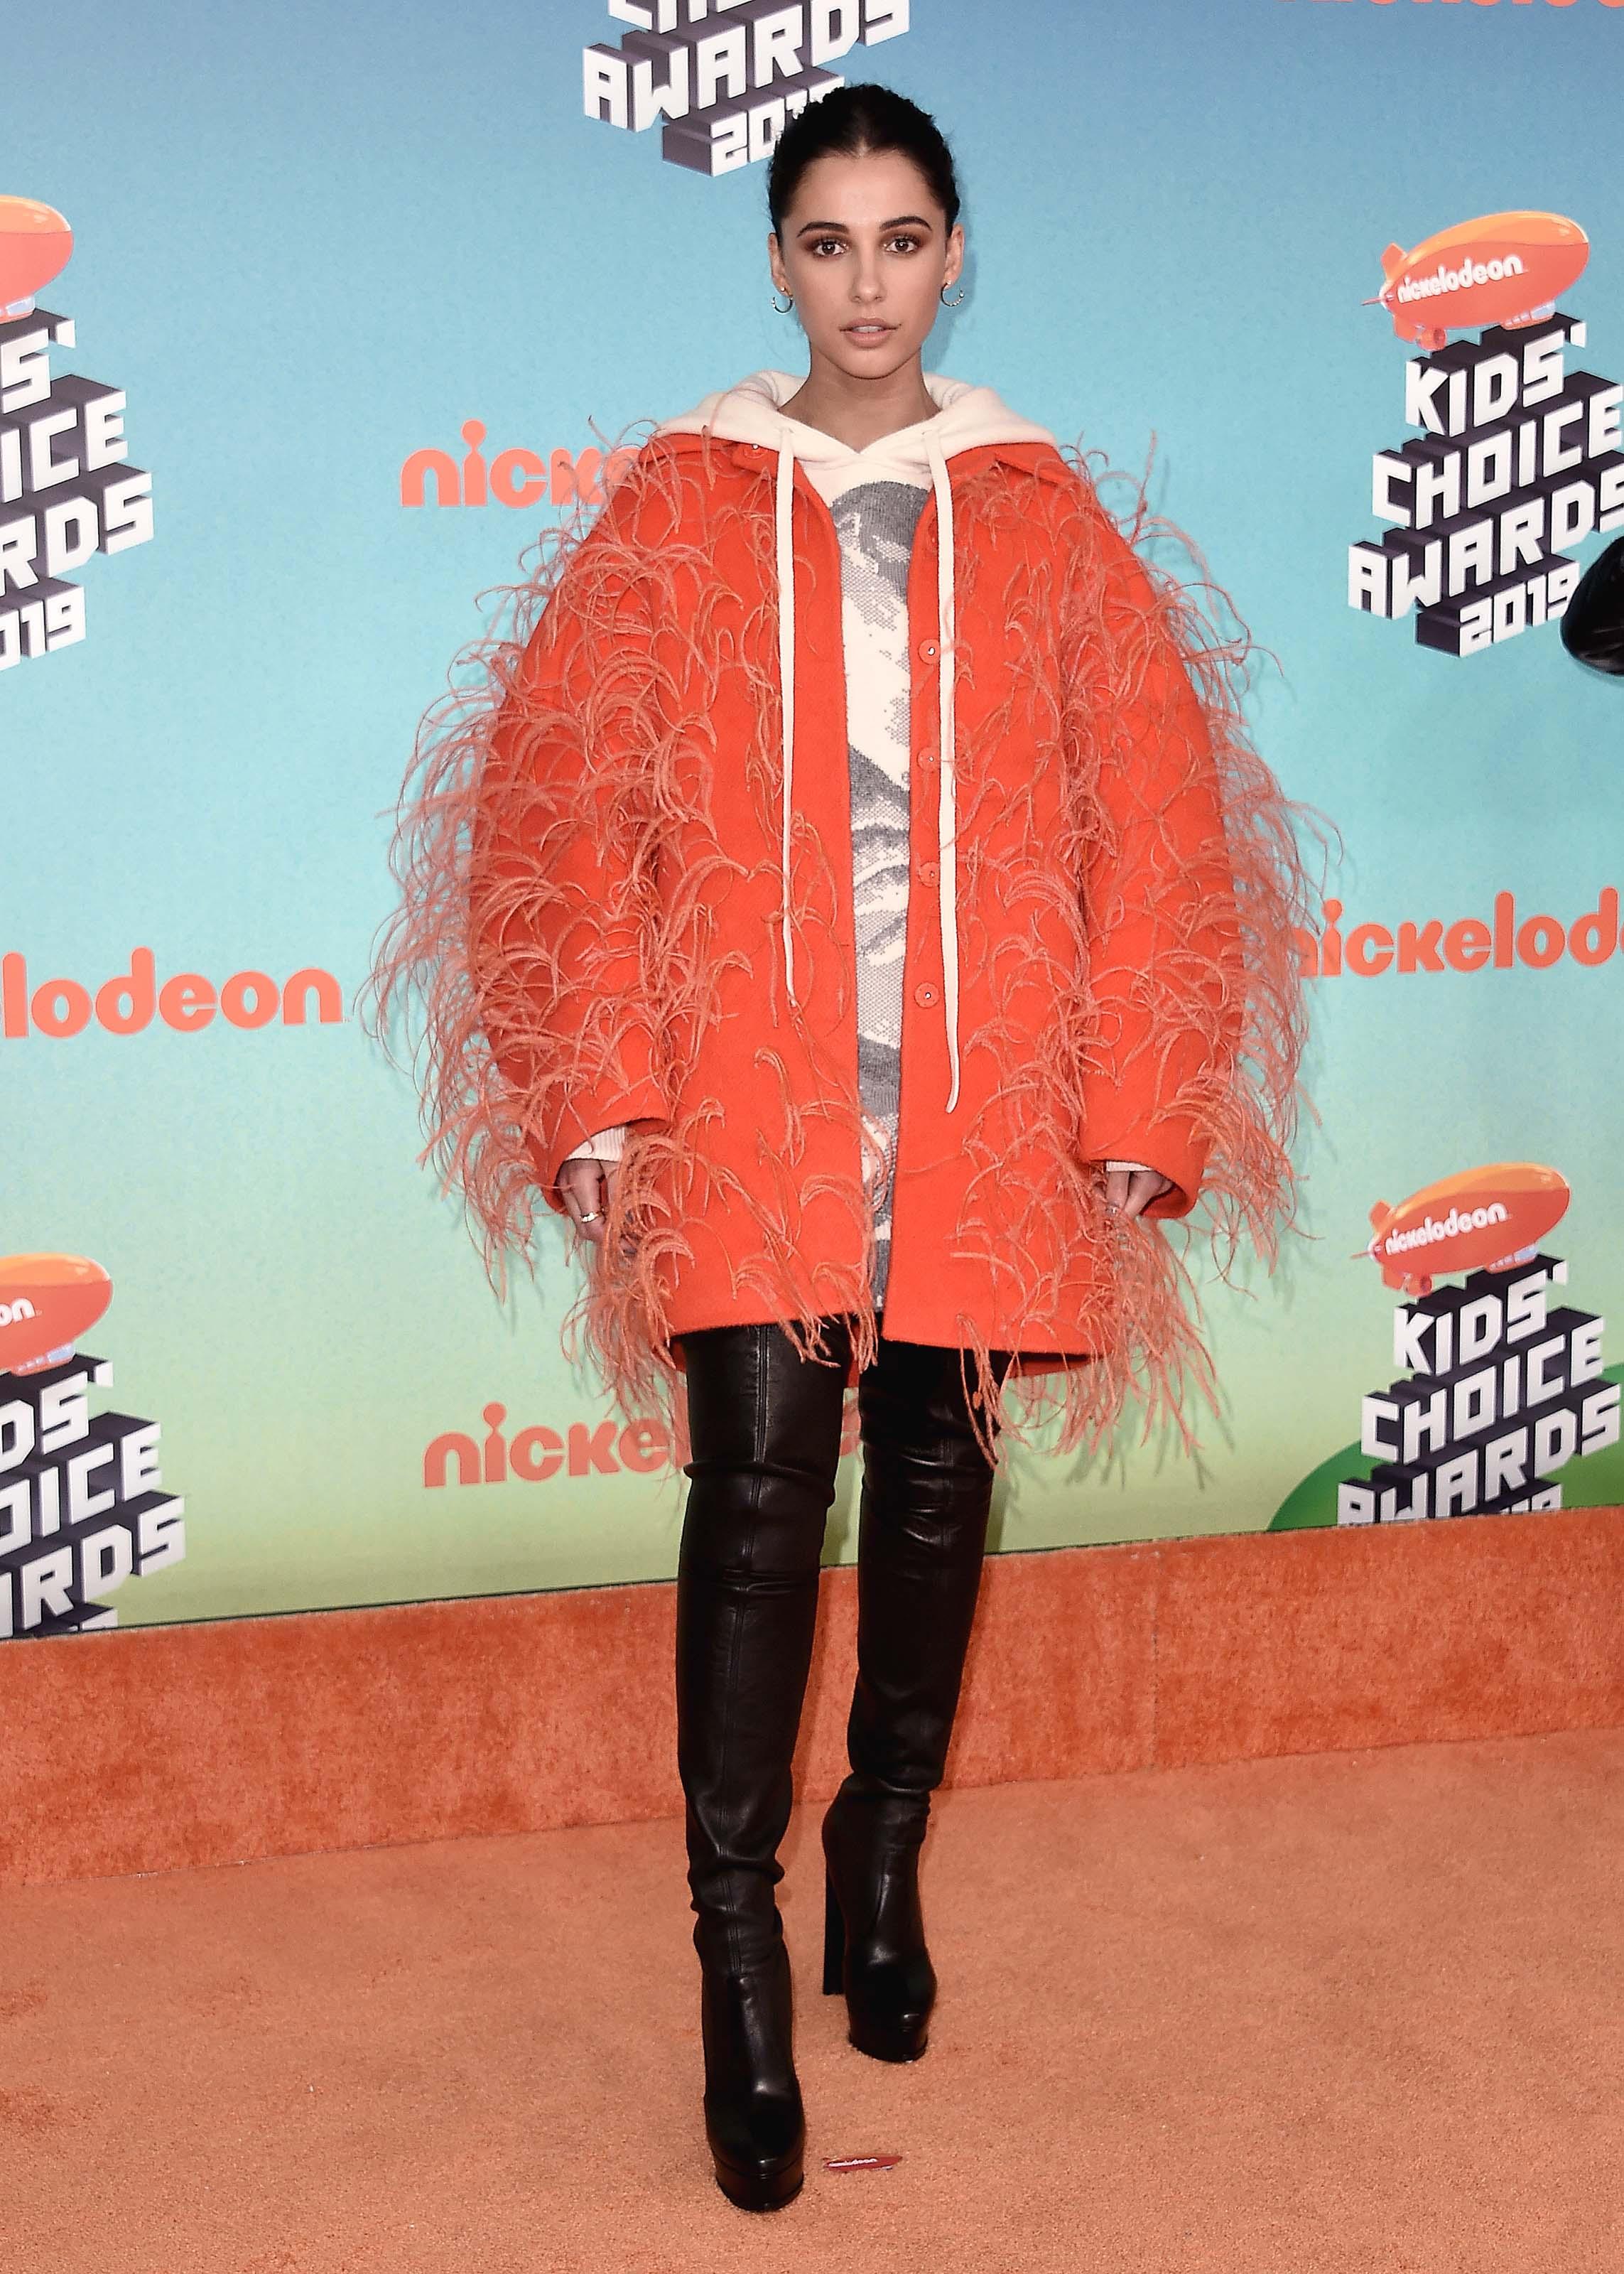 Naomi Scott attending Nickelodeon Kids' Choice Awards